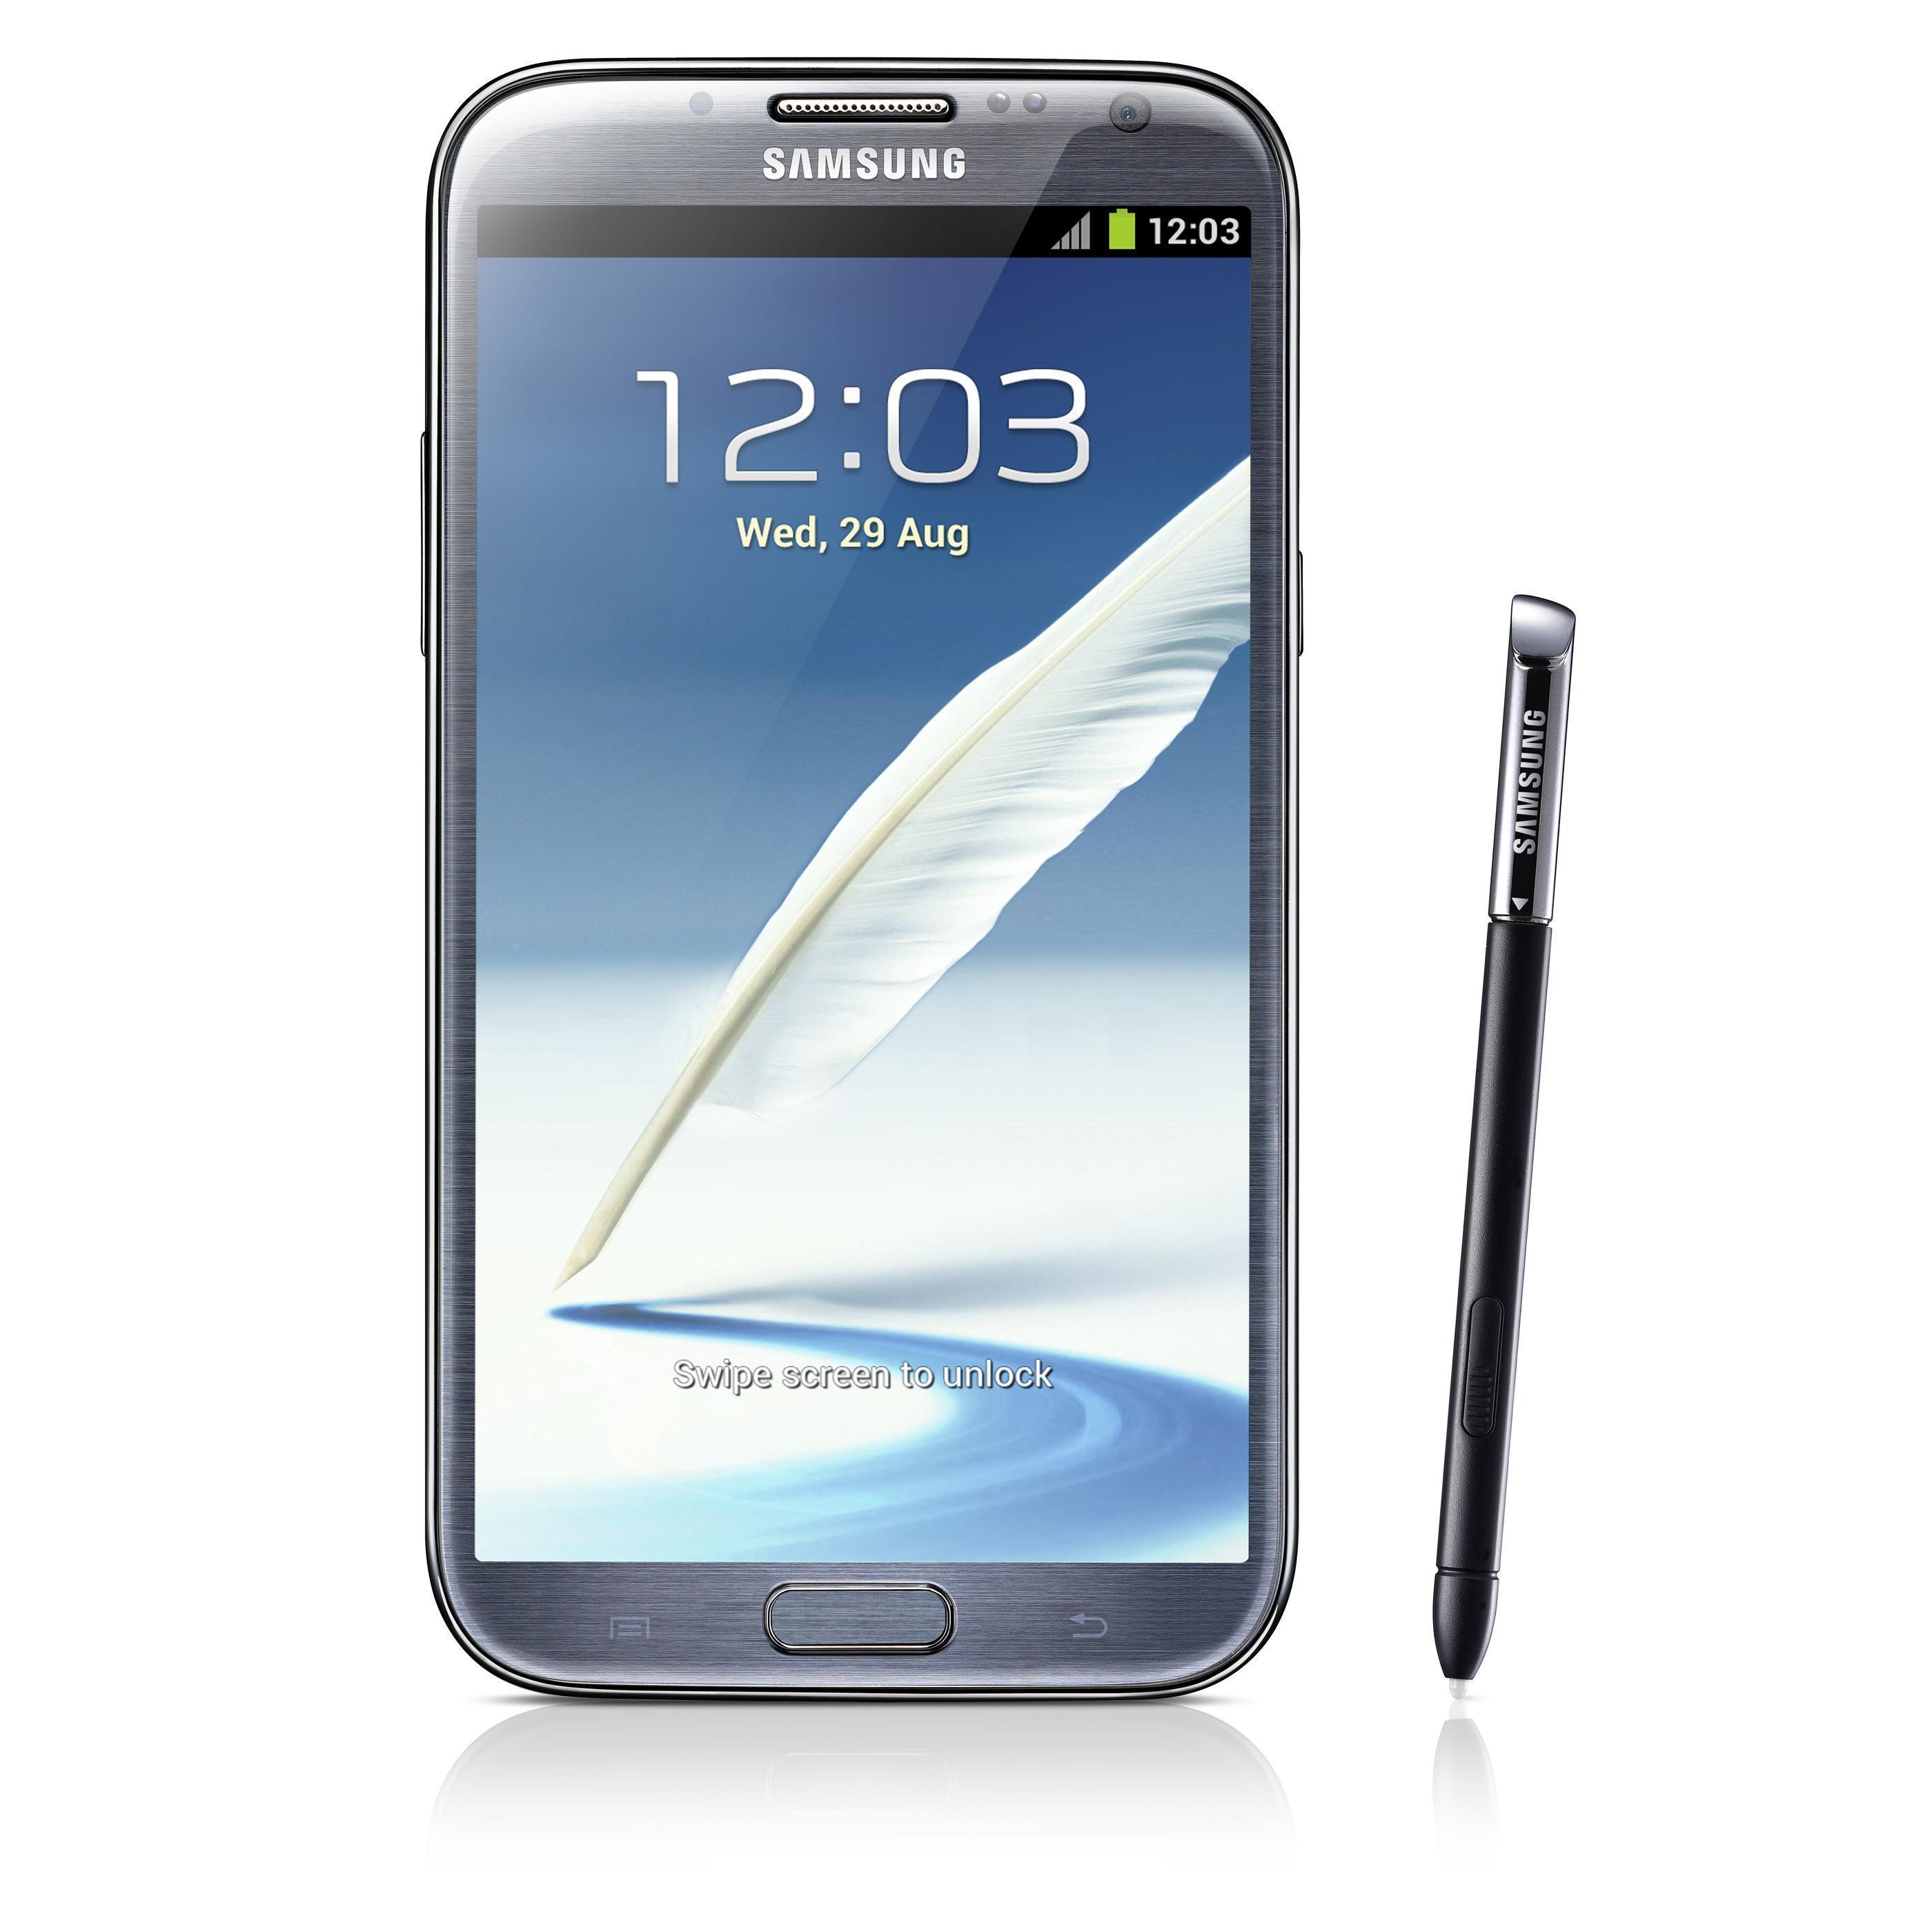 Samsung Galaxy Note 2 16 Go N7100 3G - Gris - Bouygues